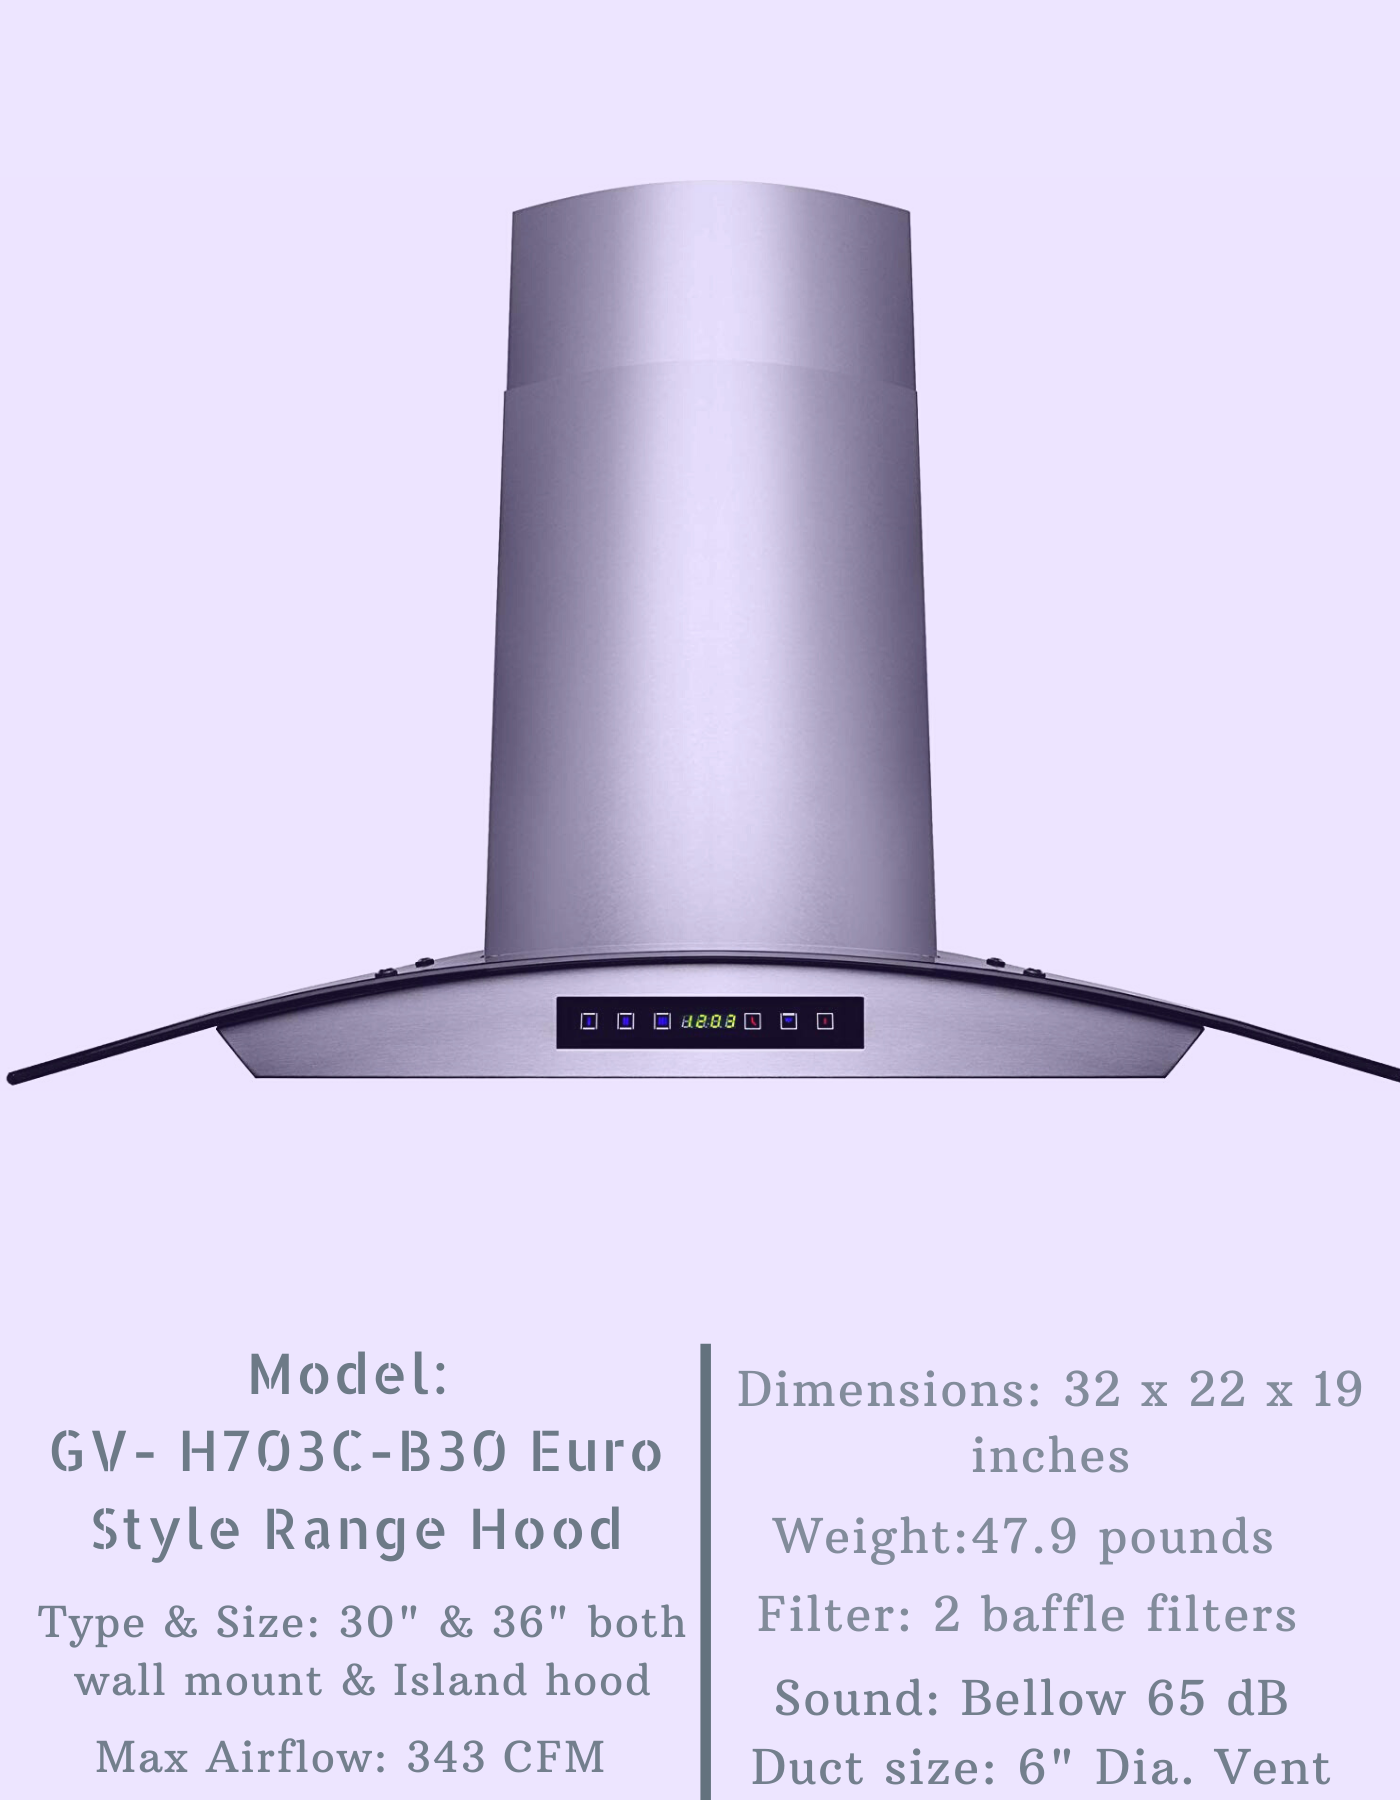 Golden Vantage H703c B30 Euro Style Range Hood Range Hood Reviews Range Hoods Euro Style